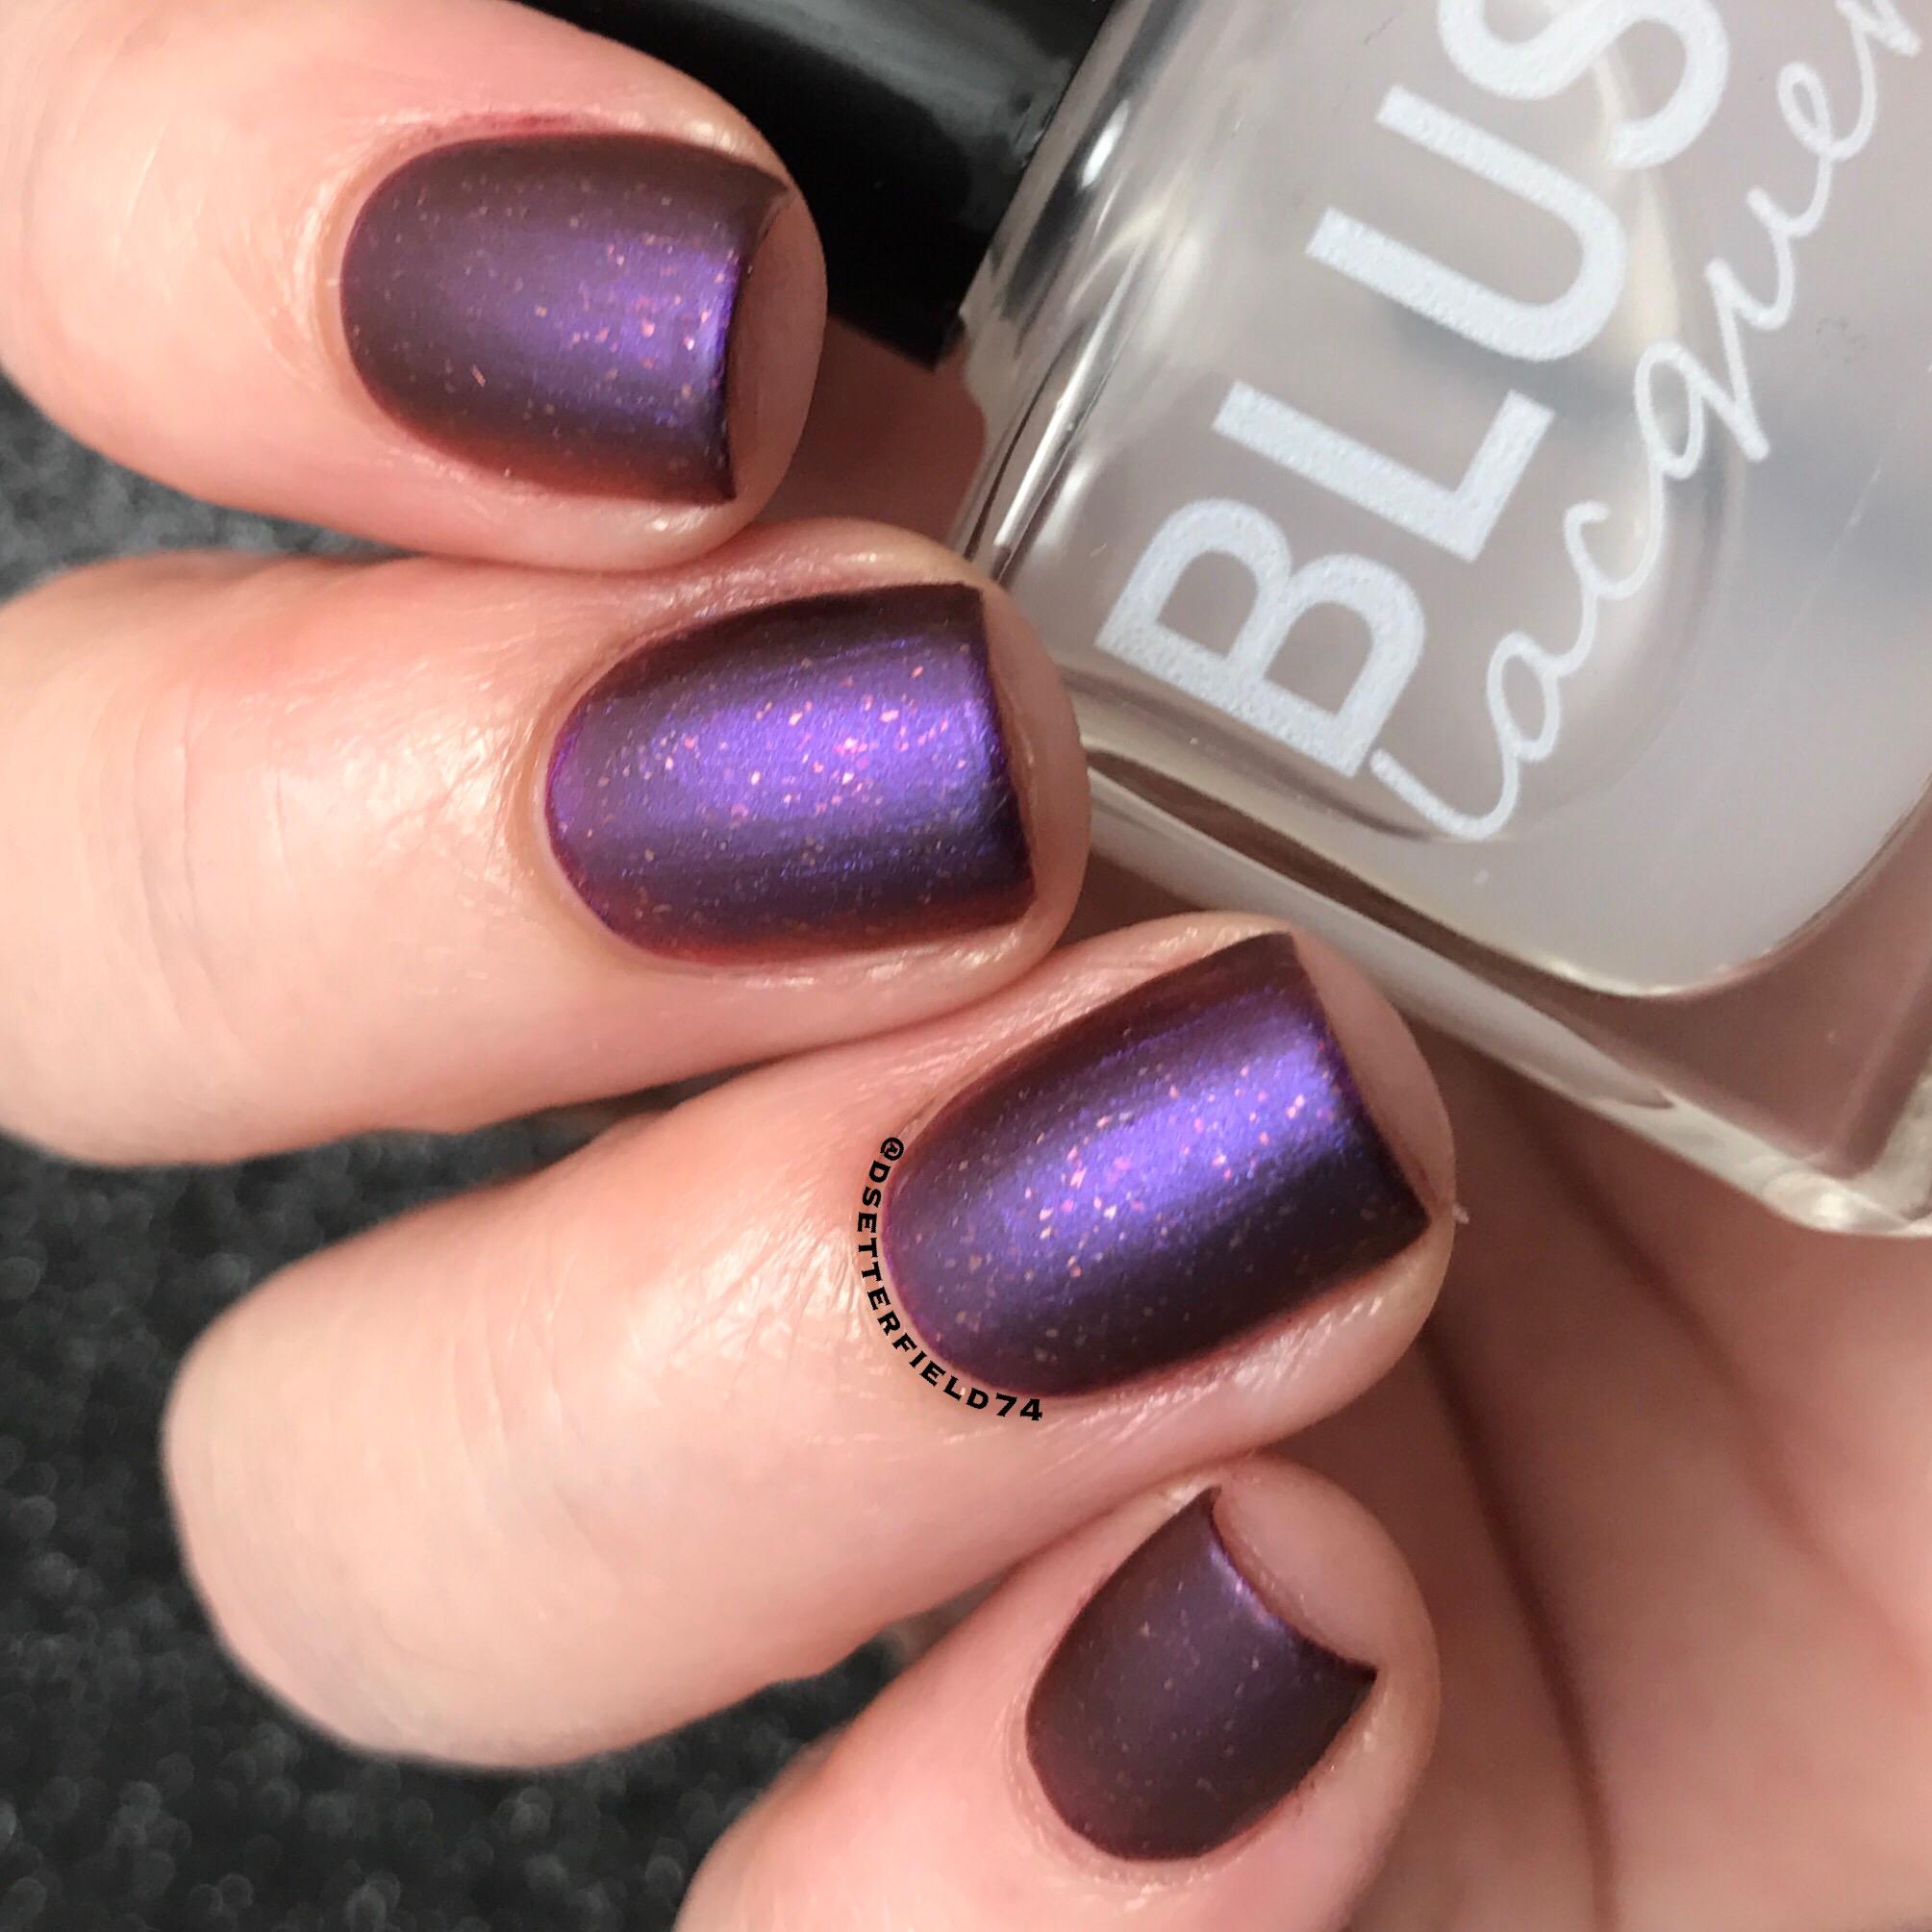 Blush Lacquers: Matterial Girl Matte Top Coat (plus two nail polish ...